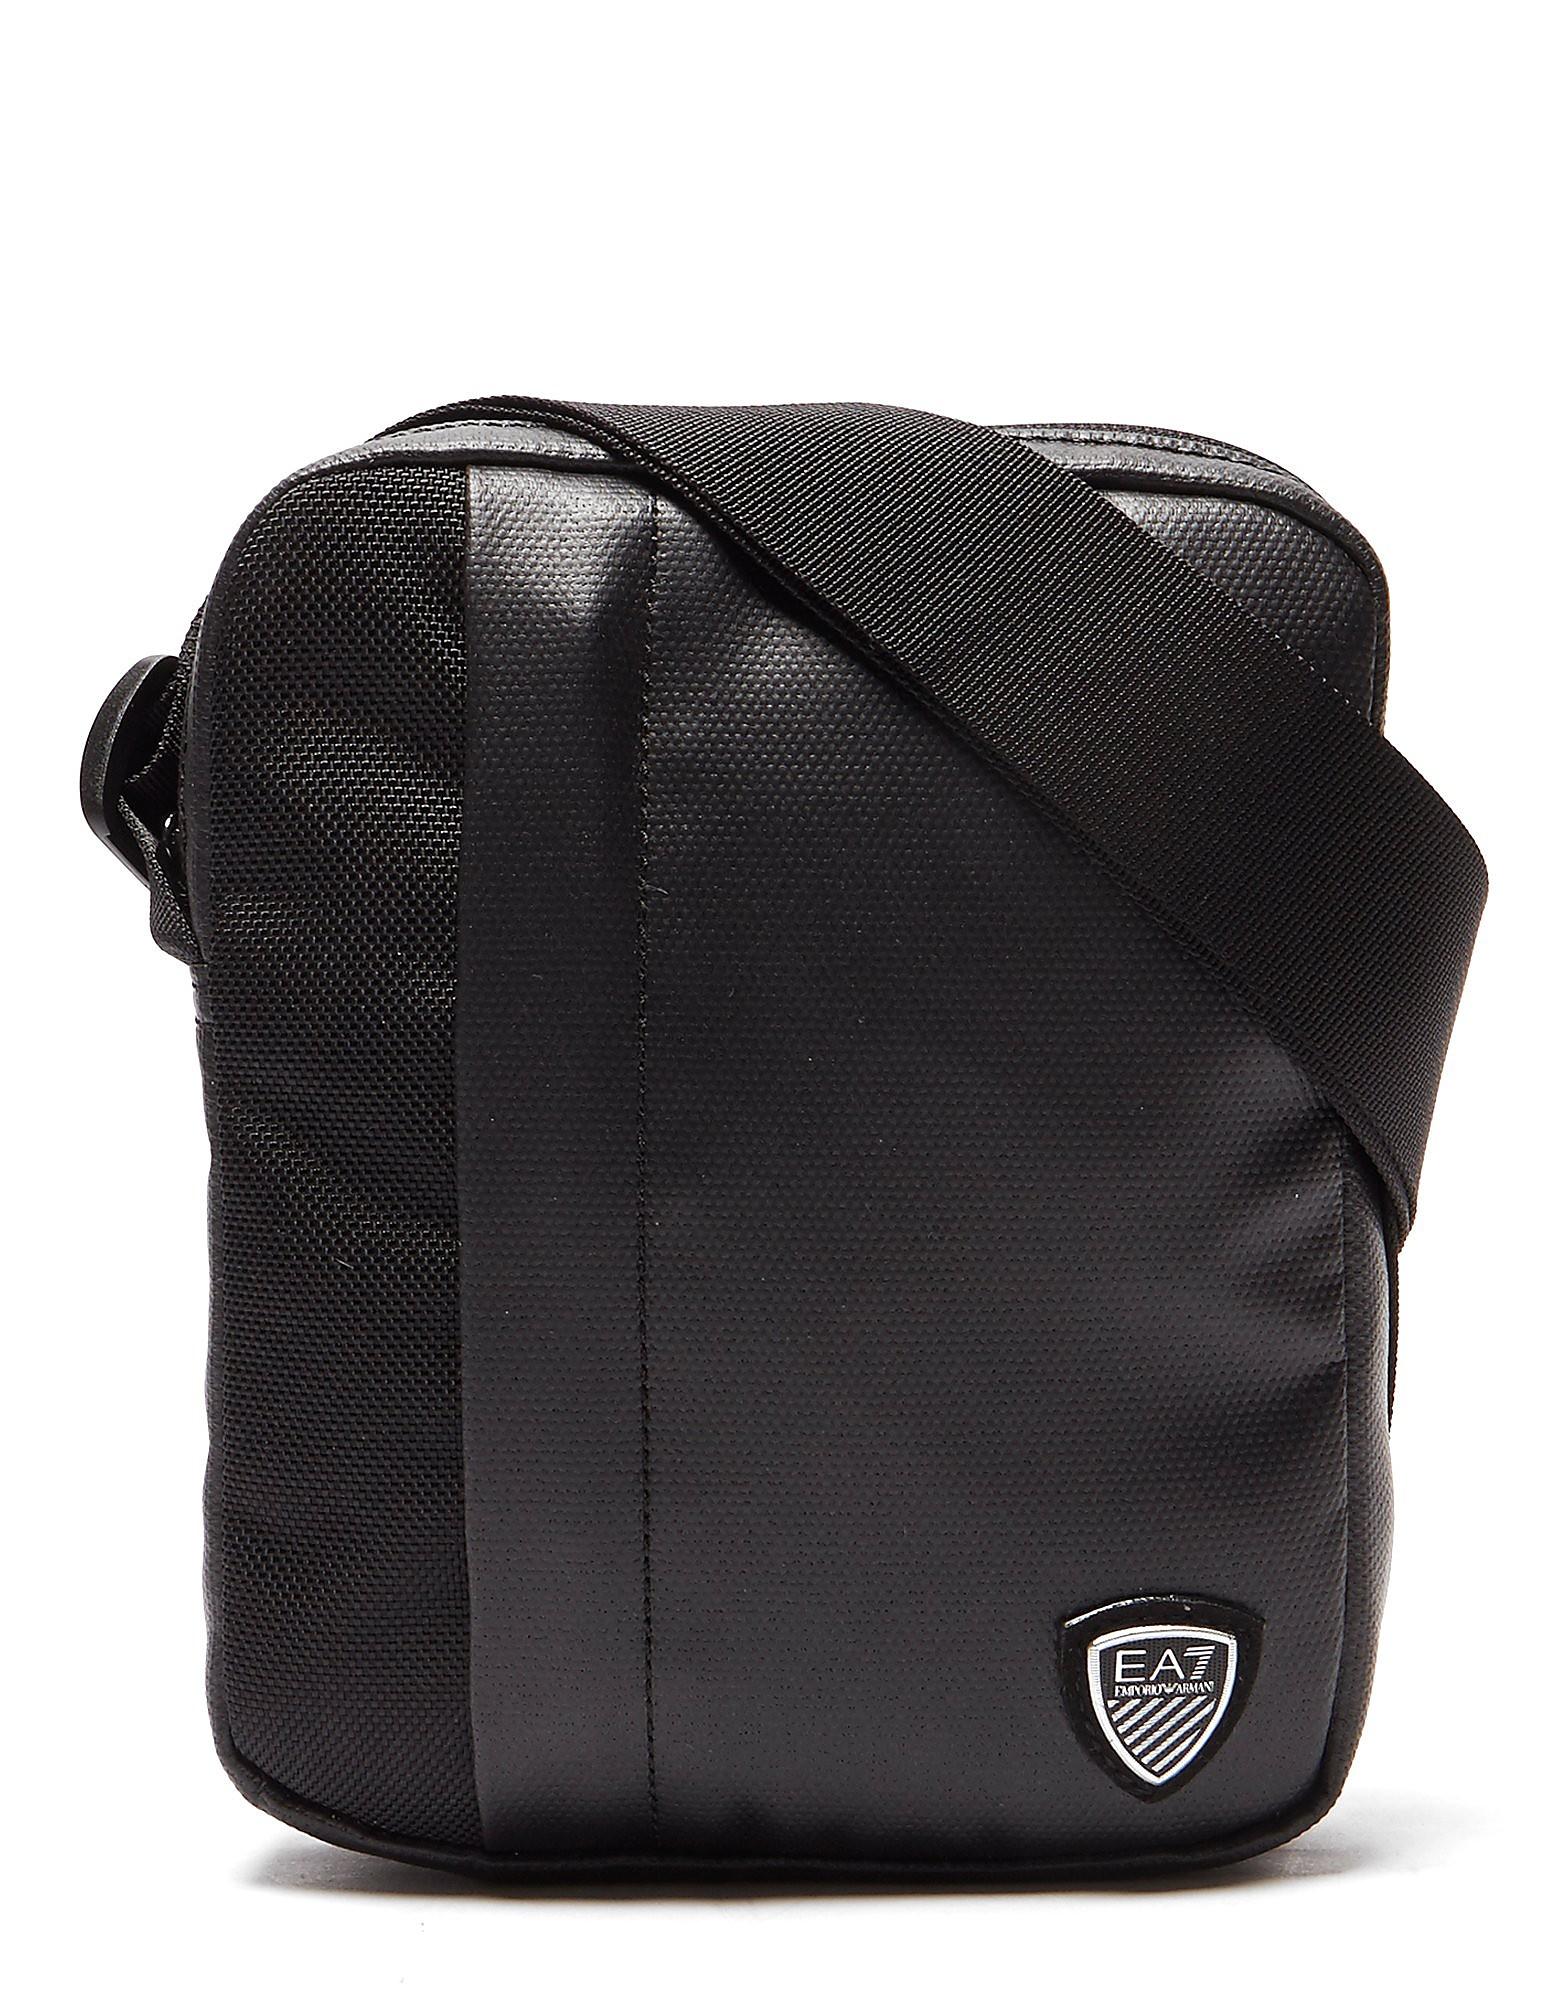 Emporio Armani EA7 Train Soccer Bag